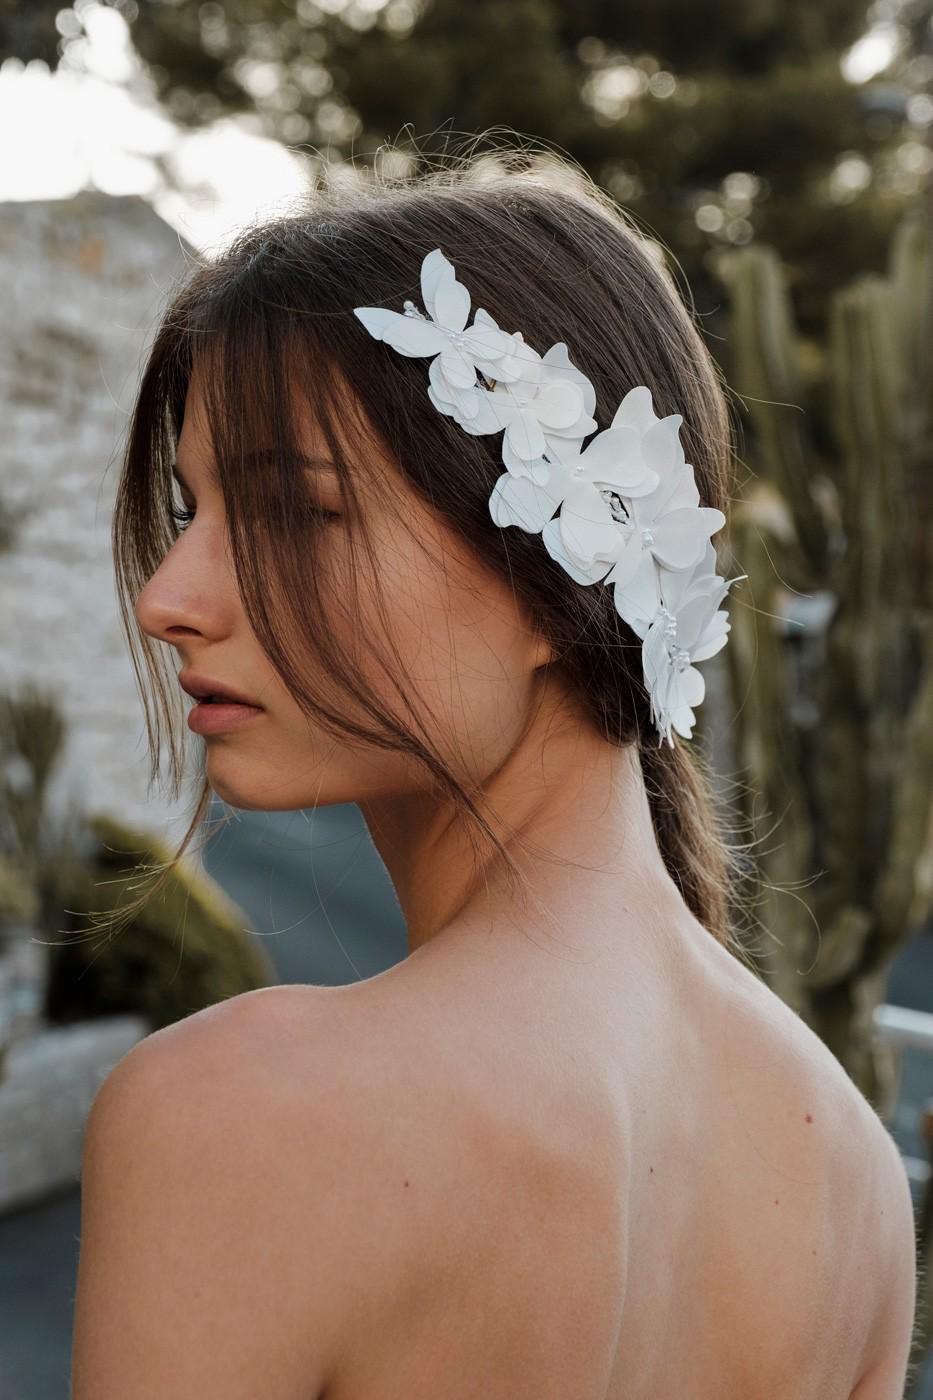 ELISA_NESS_Collection_2020_Paola_05